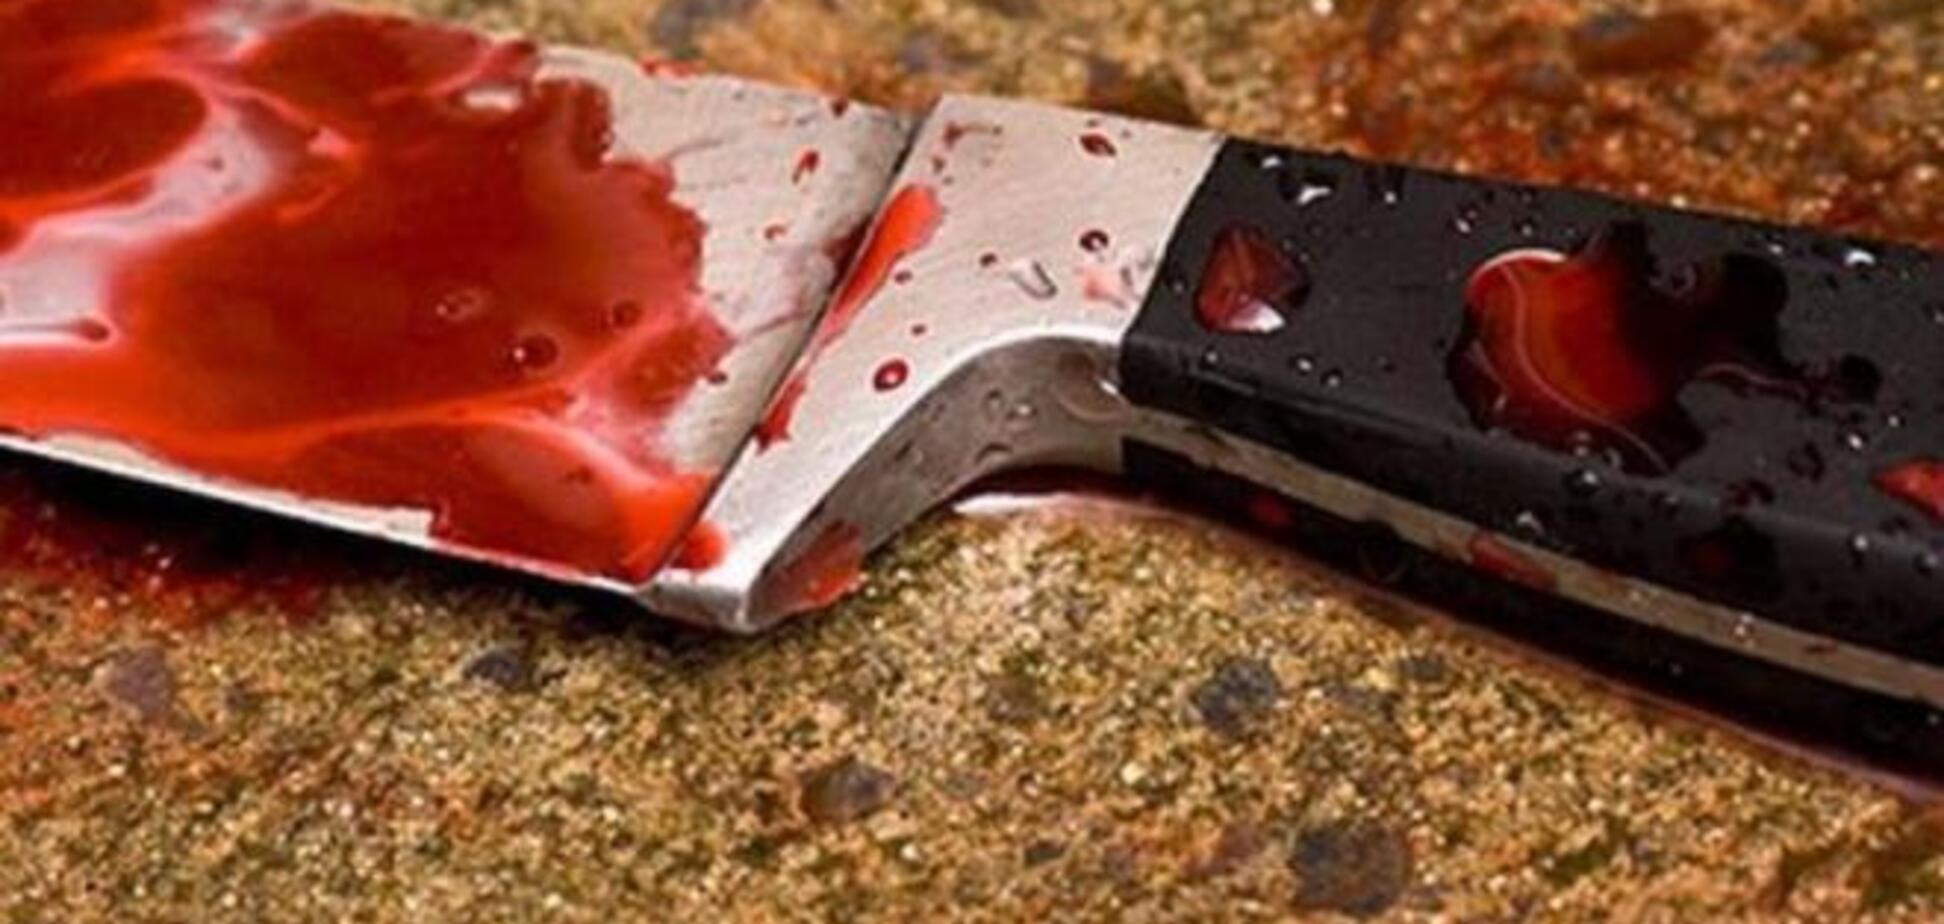 В Кировограде студент-летчик из Ливии напал с ножом на педагога